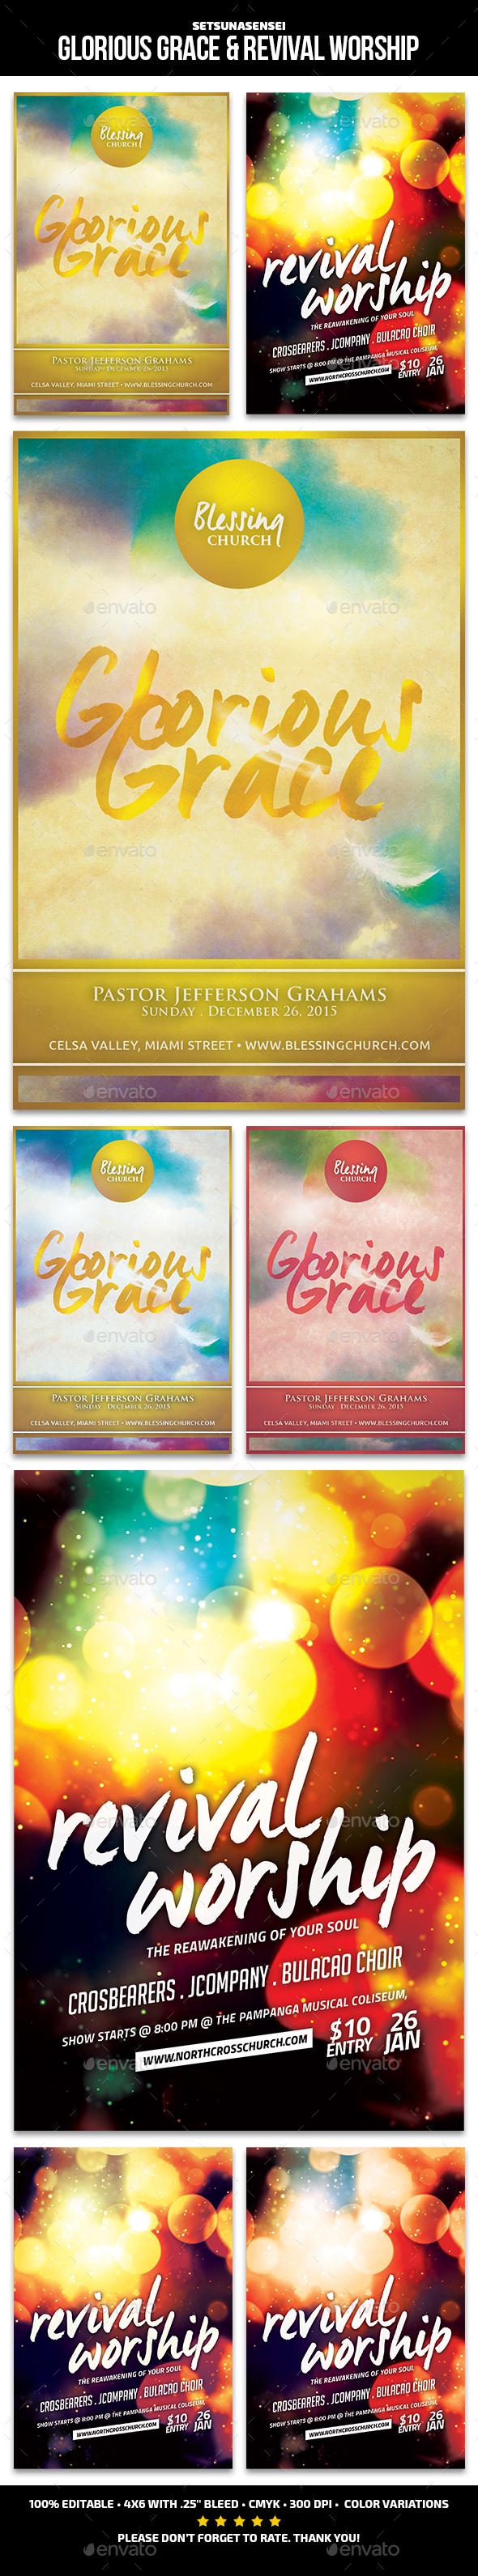 Glorious Grace & Revival Worship - Church Flyers